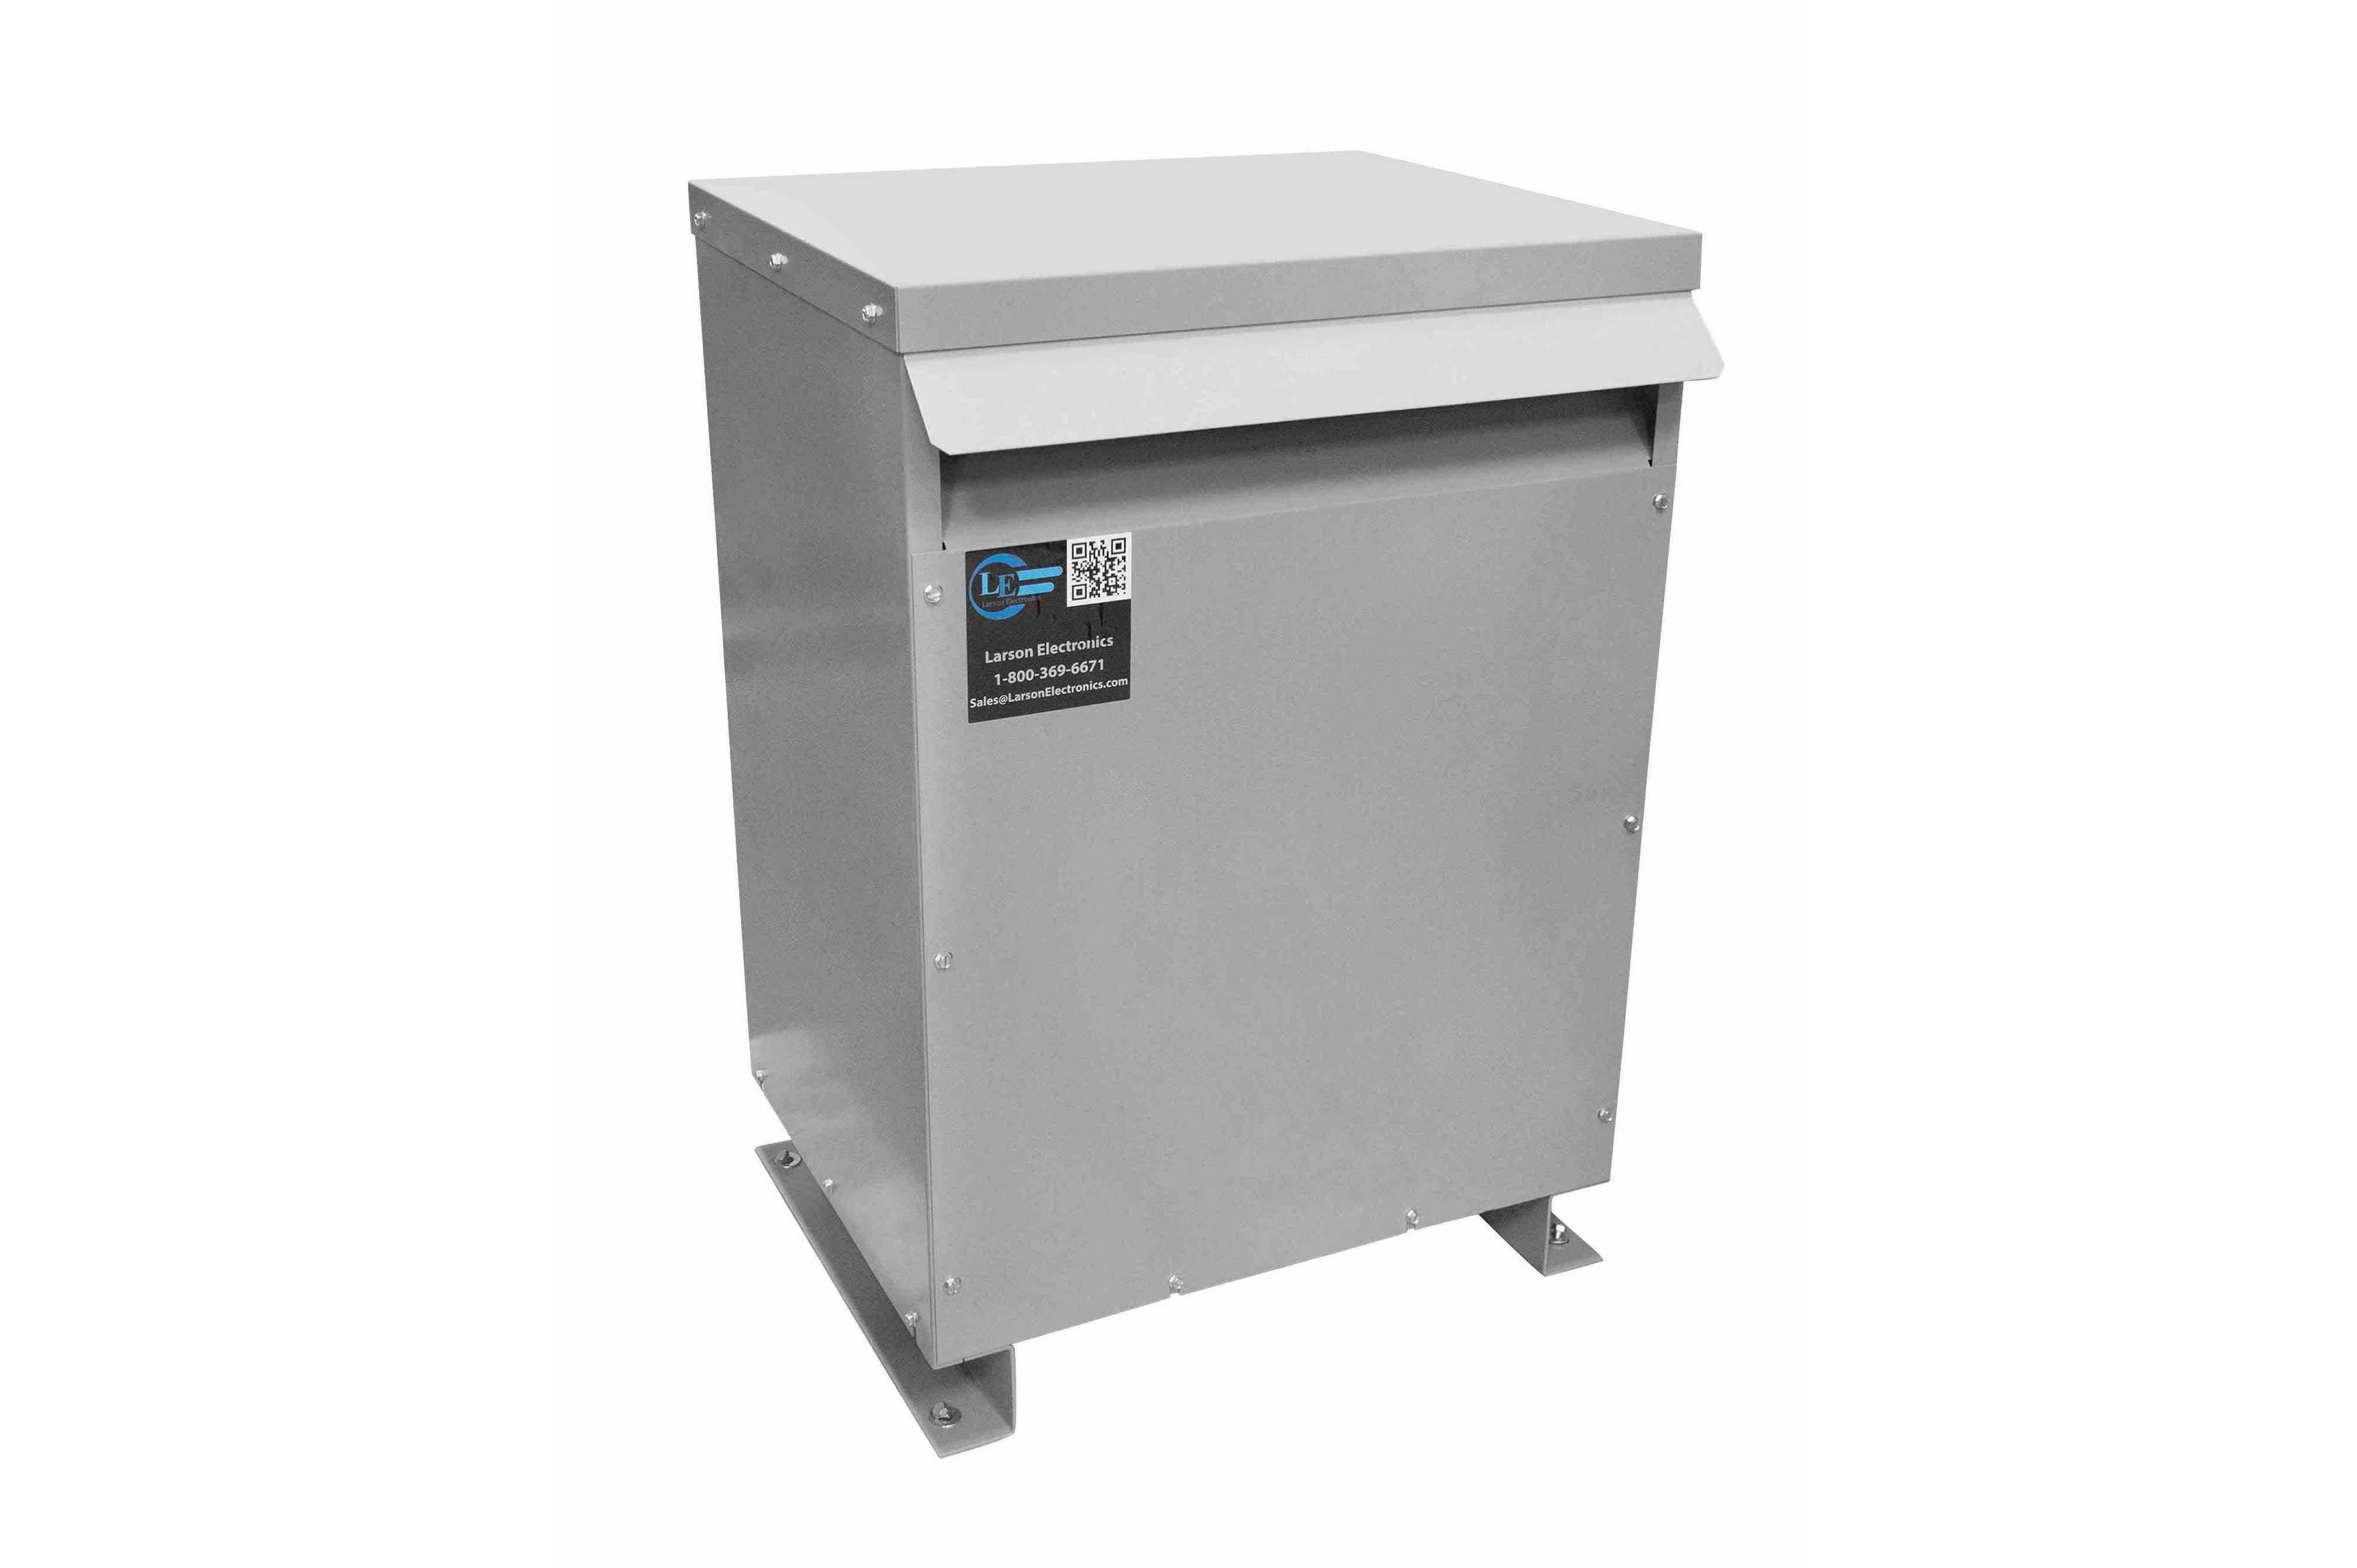 60 kVA 3PH Isolation Transformer, 208V Wye Primary, 400Y/231 Wye-N Secondary, N3R, Ventilated, 60 Hz